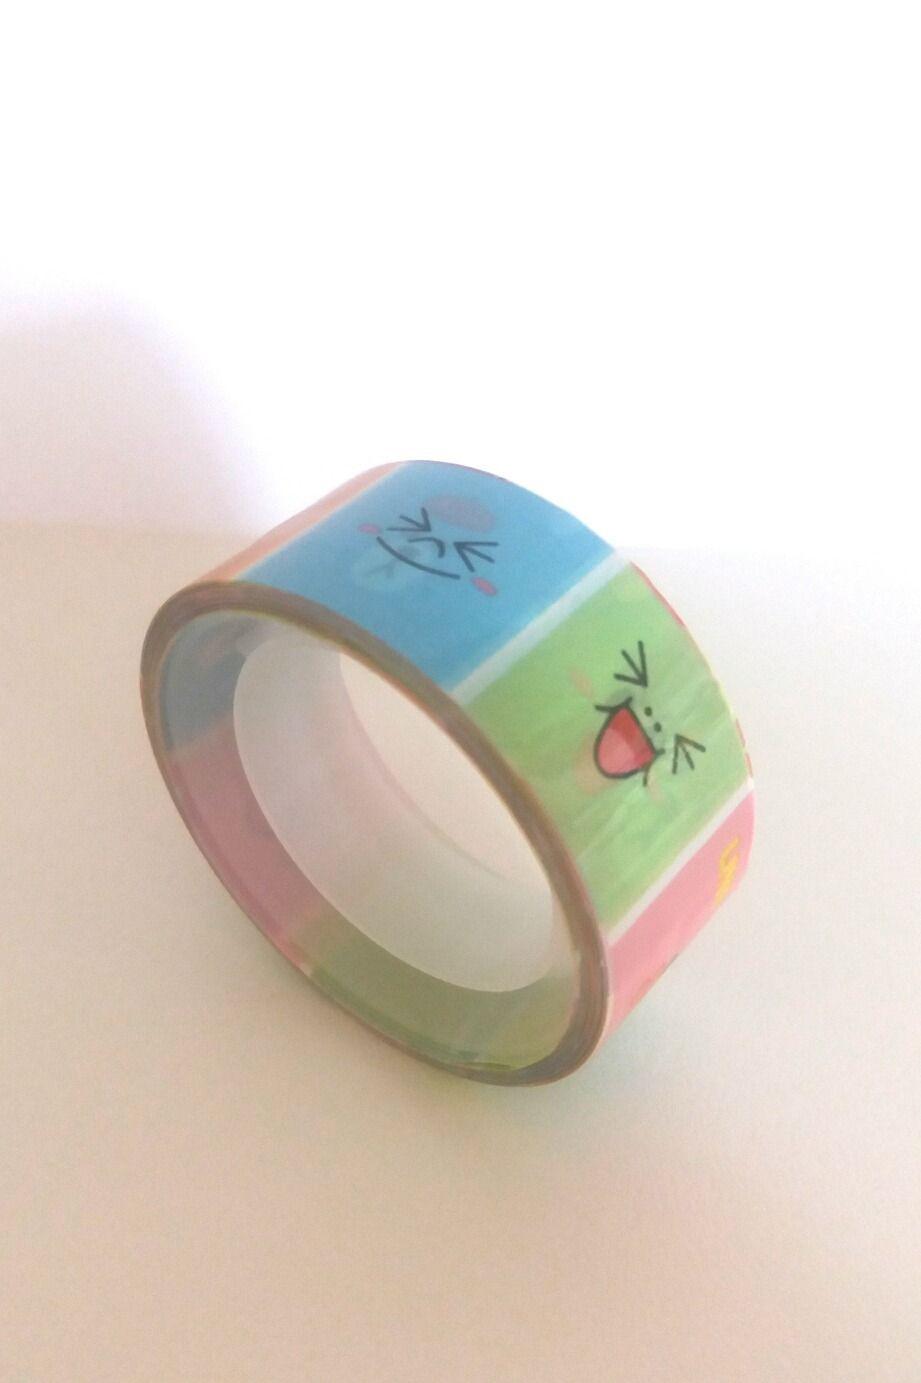 Ruban adhésif kawaii nounours emoticônes Line : Masking tape par mipouni81